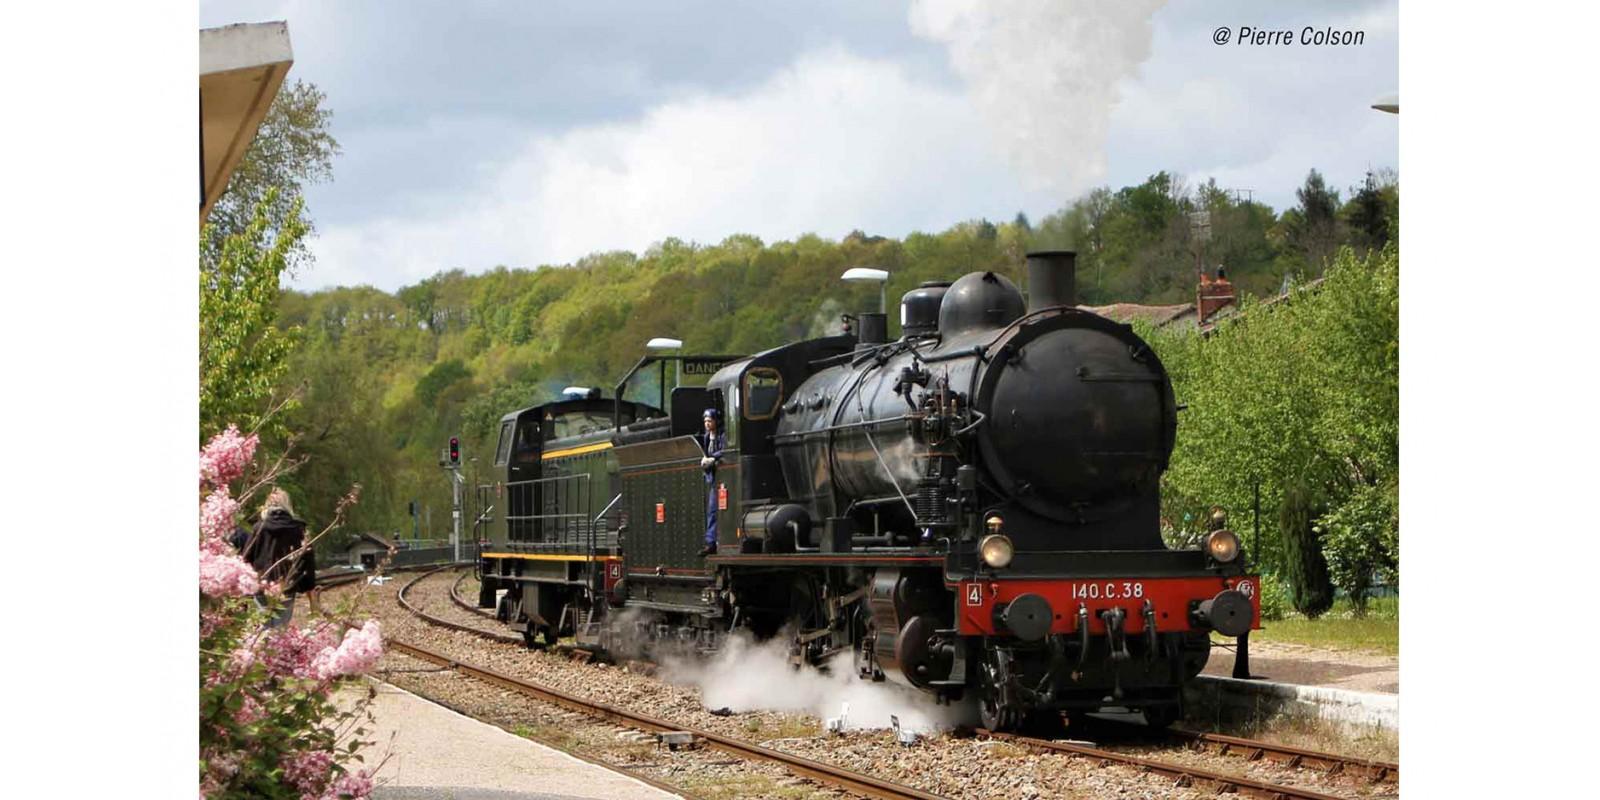 JO2406S SNCF, 140 C 38, tender 18 B 22 (Est), black, red lining, golden boiler rings DCC Sound